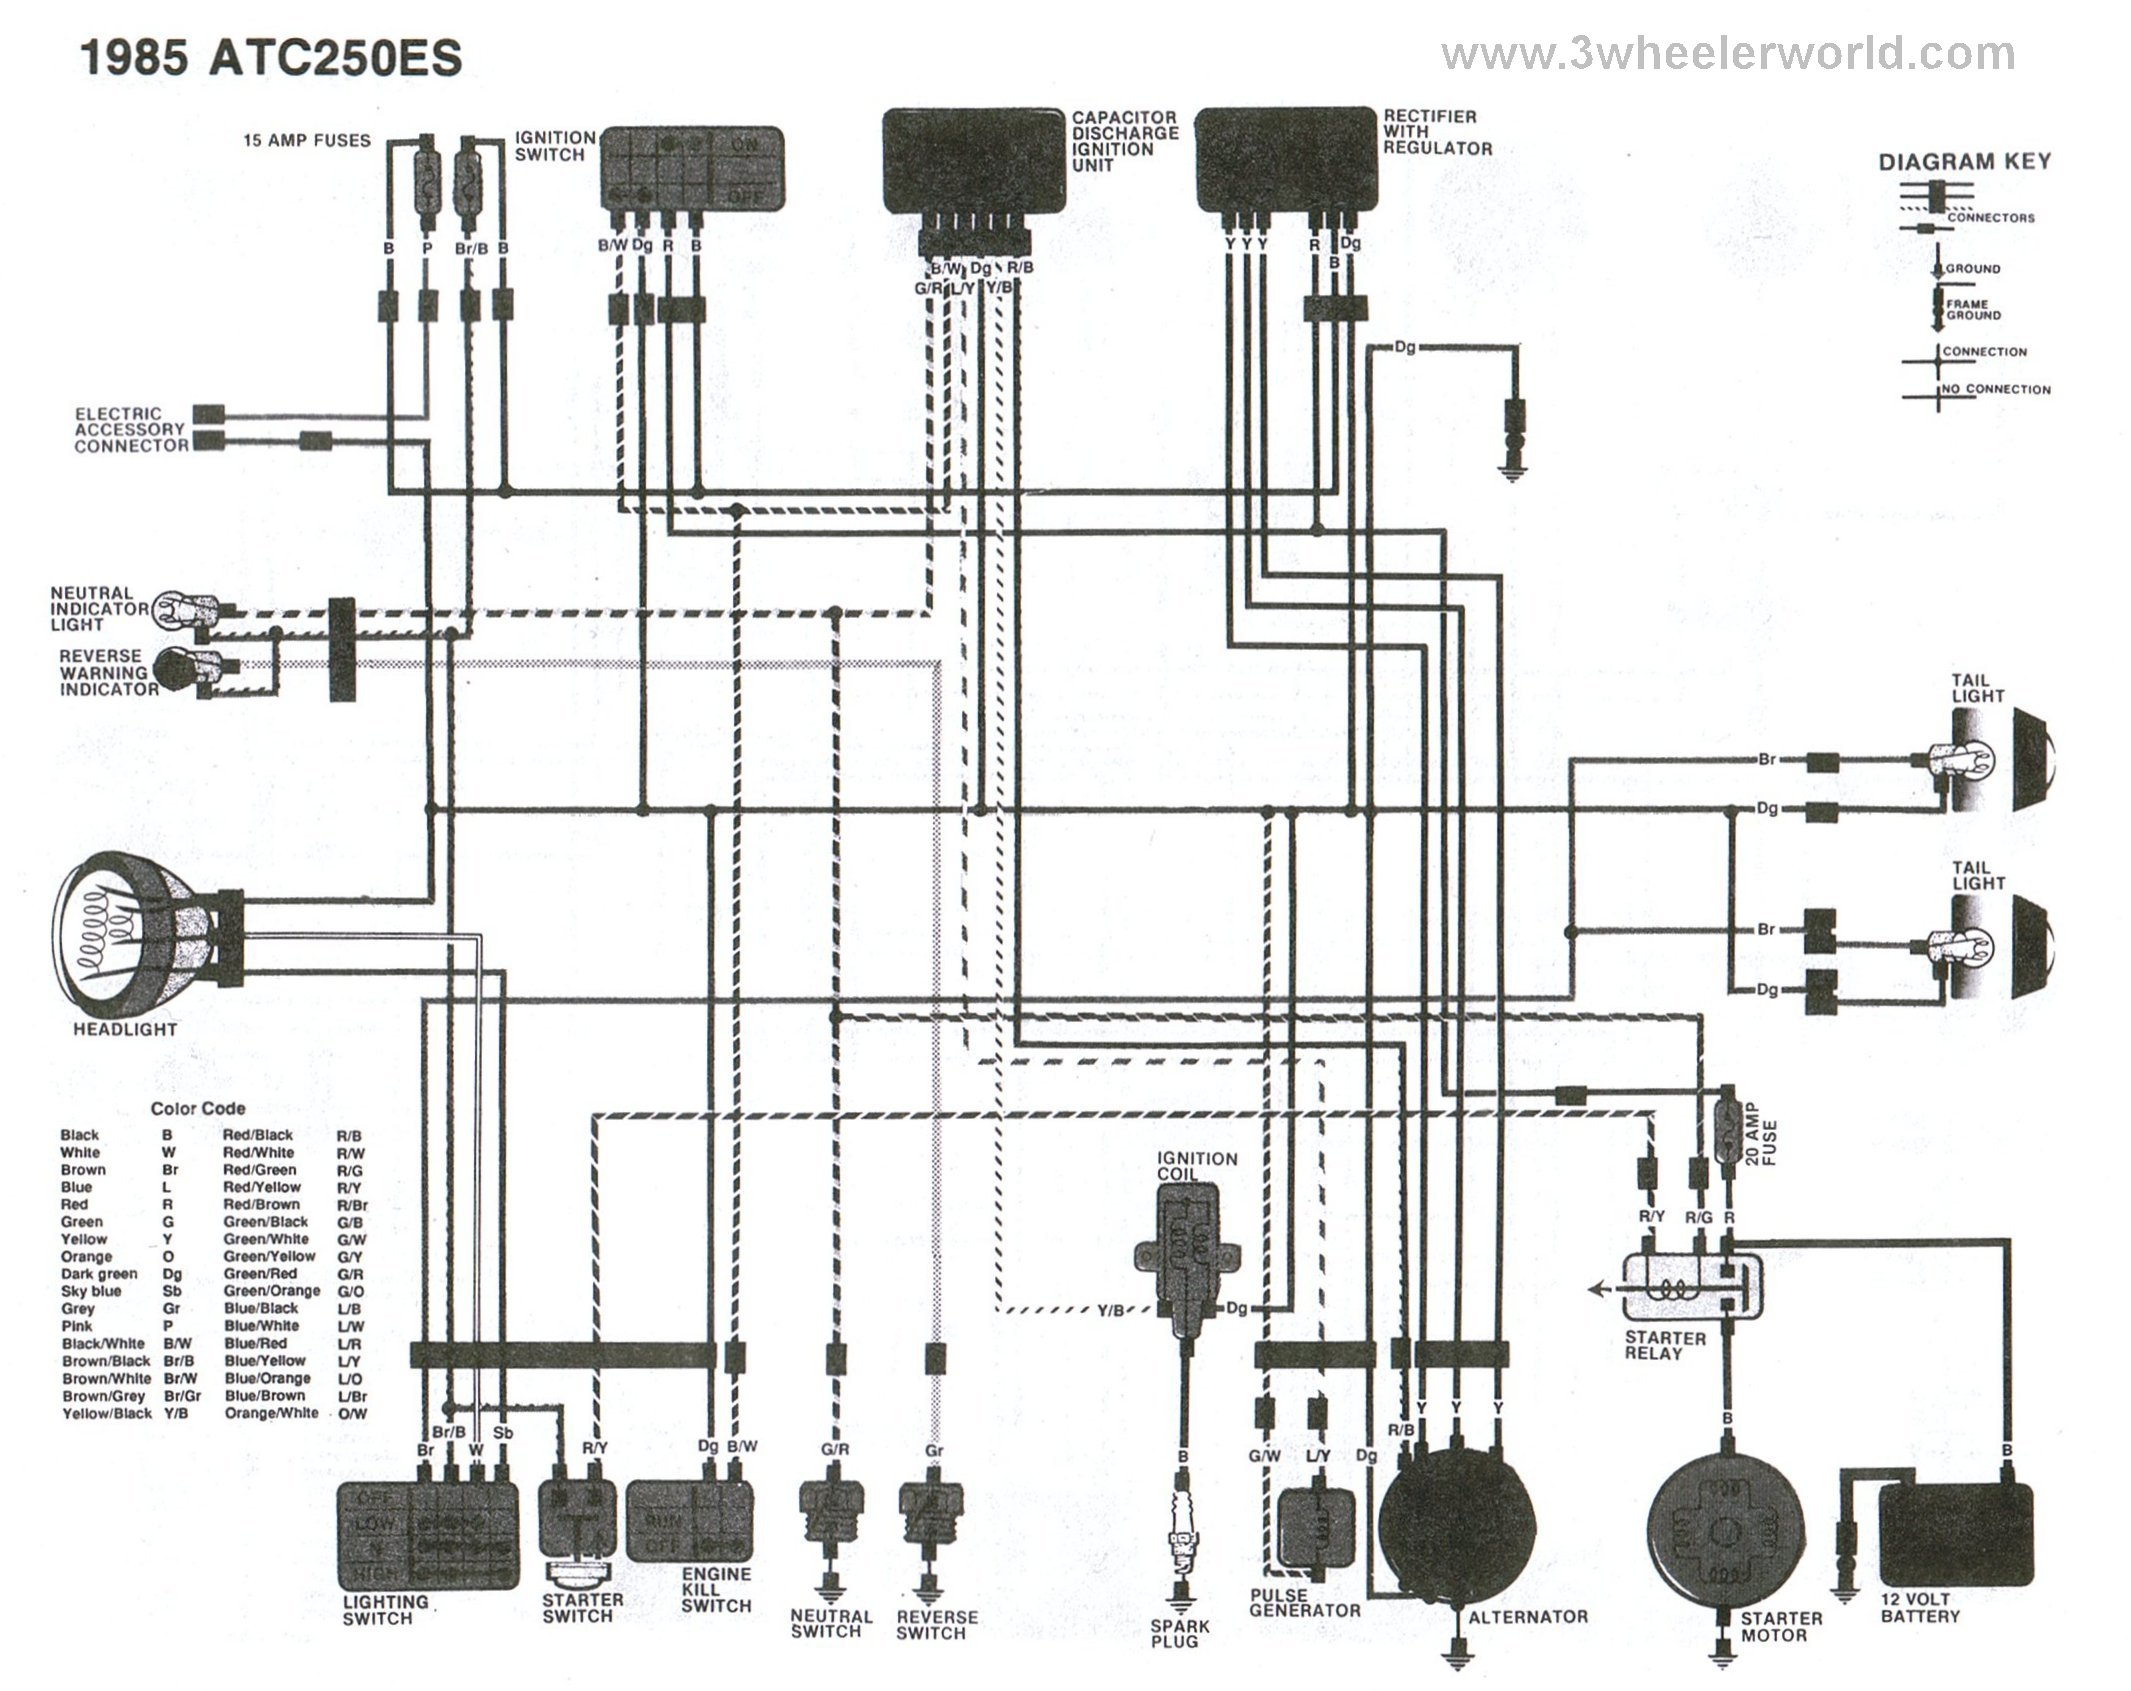 1984 honda 125 atc wiring diagram